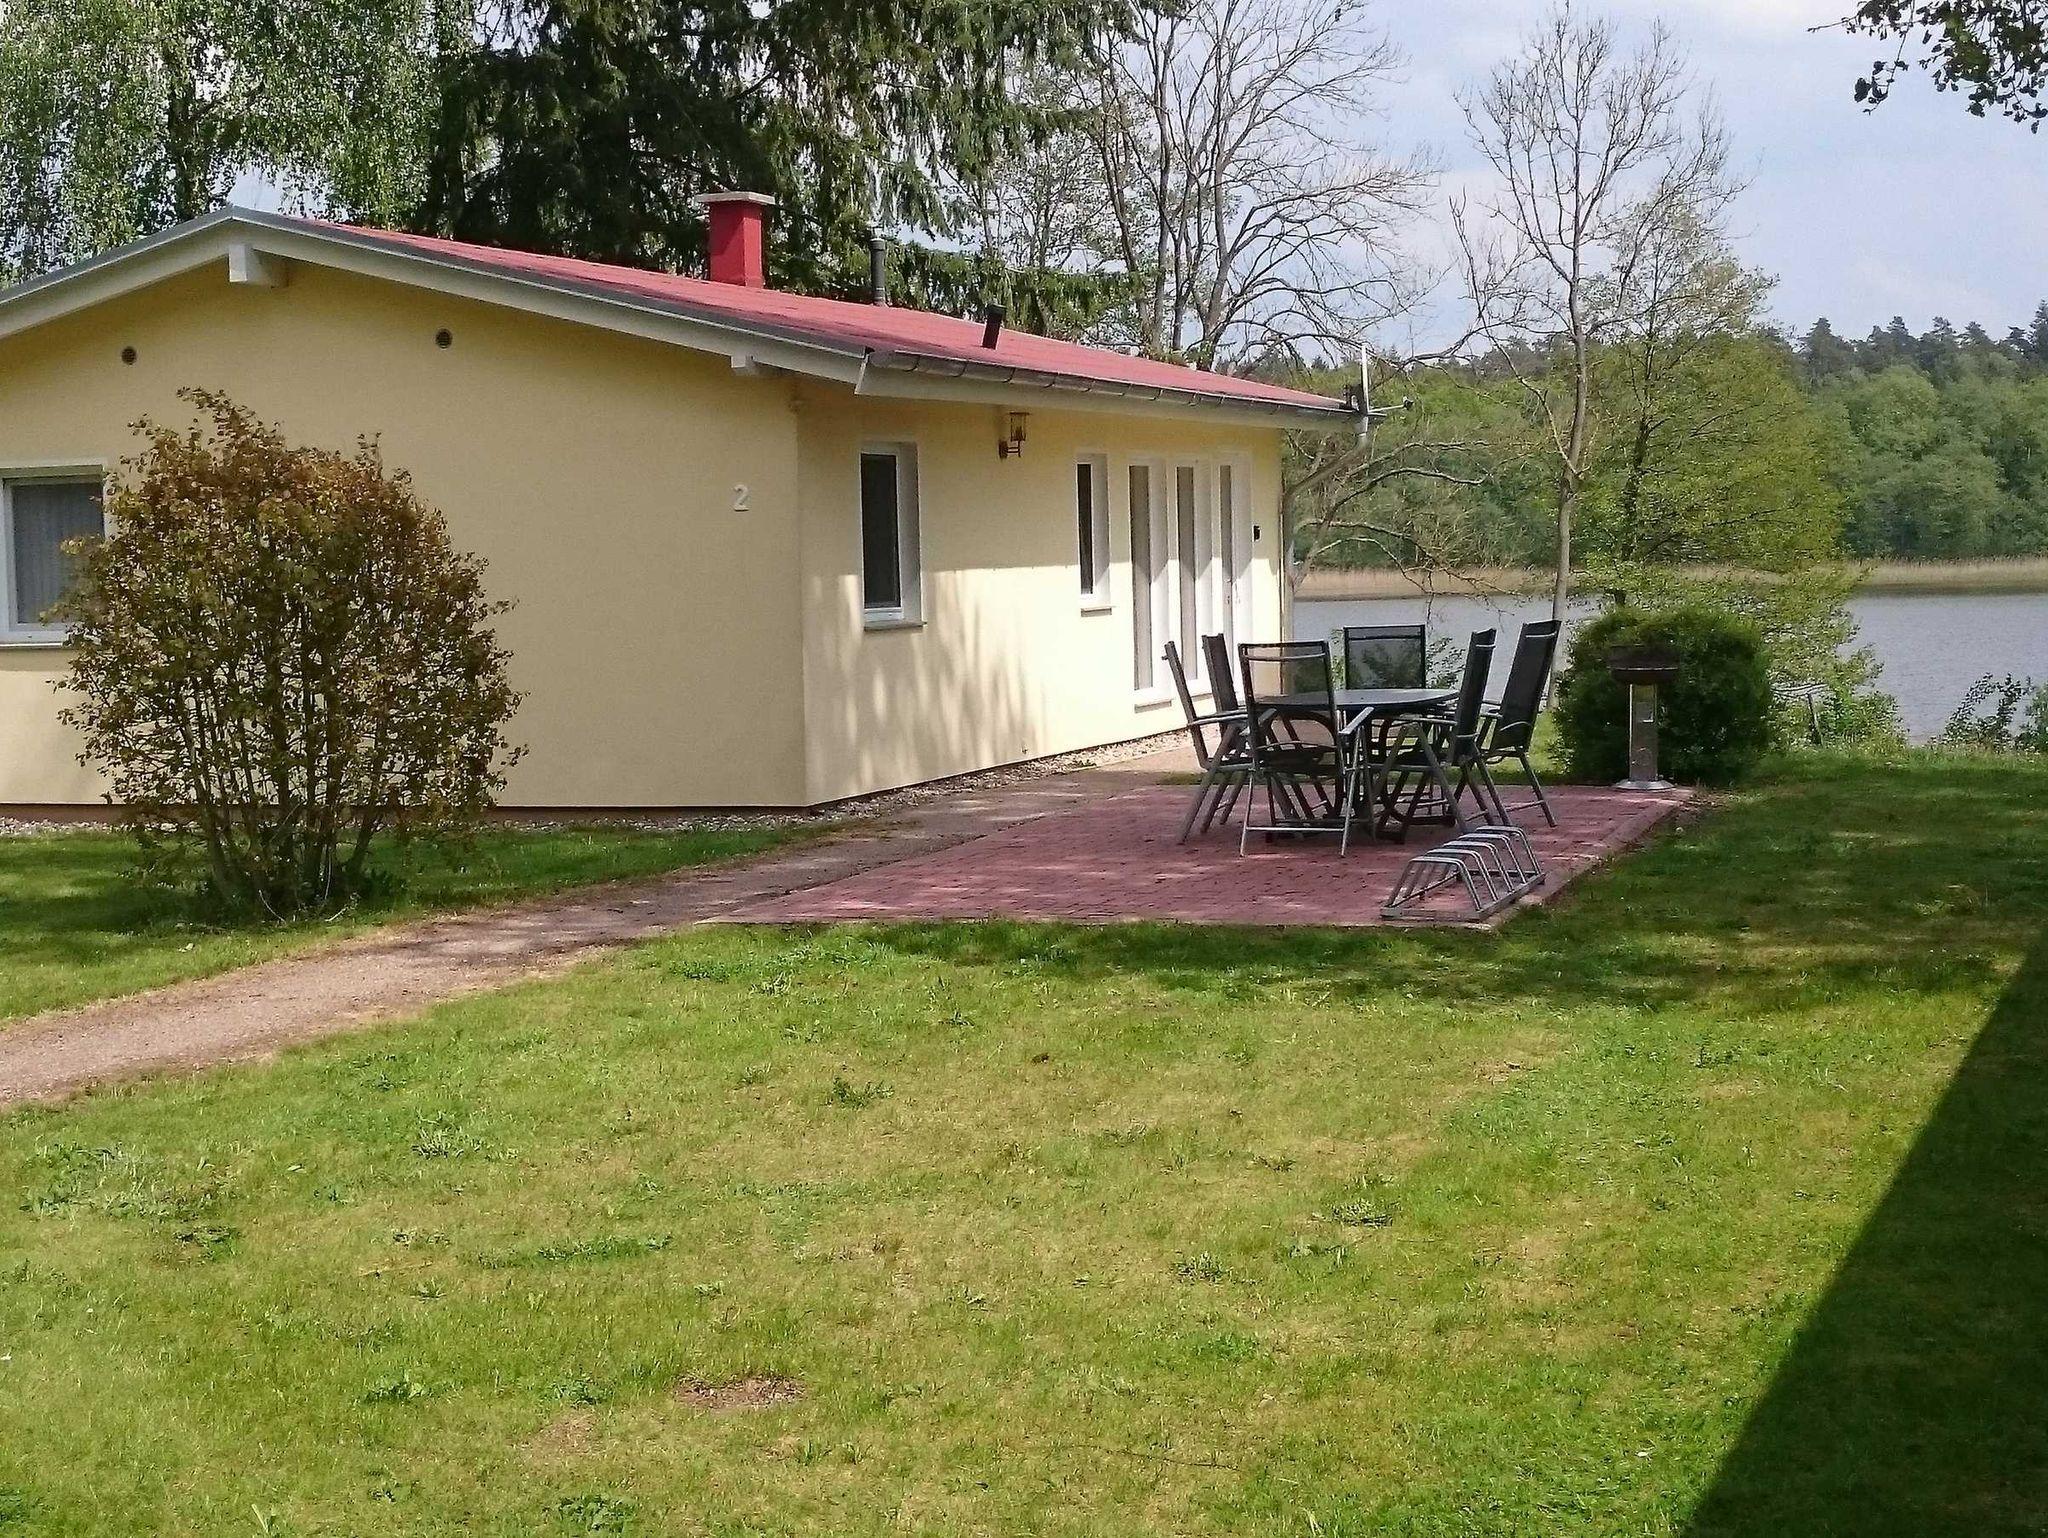 Ferienh�user Seewiesen, Ferienhaus Nr. 2